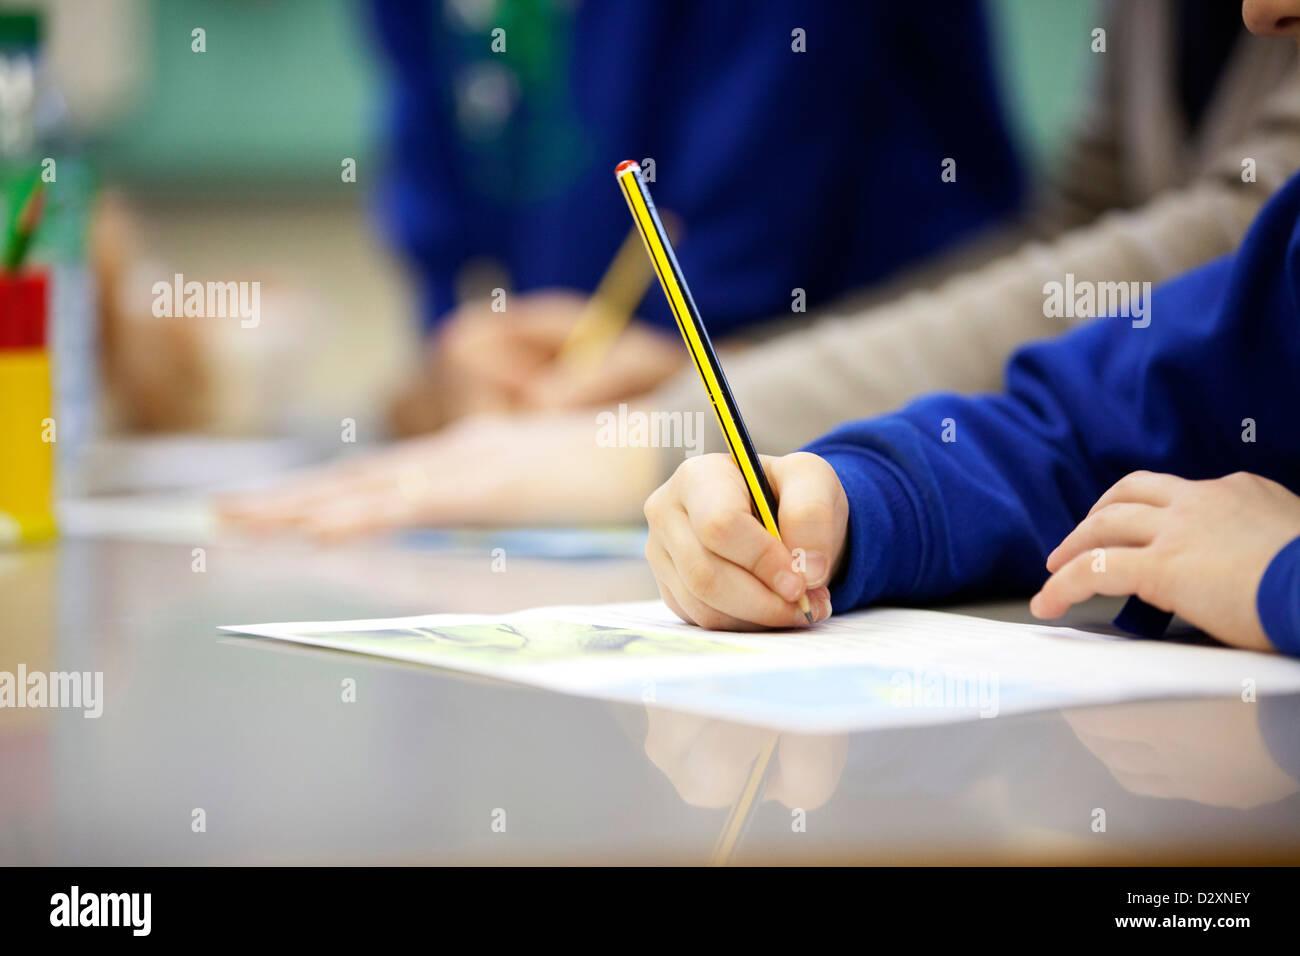 primary school boy writing on work sheet in classroom Stock Photo